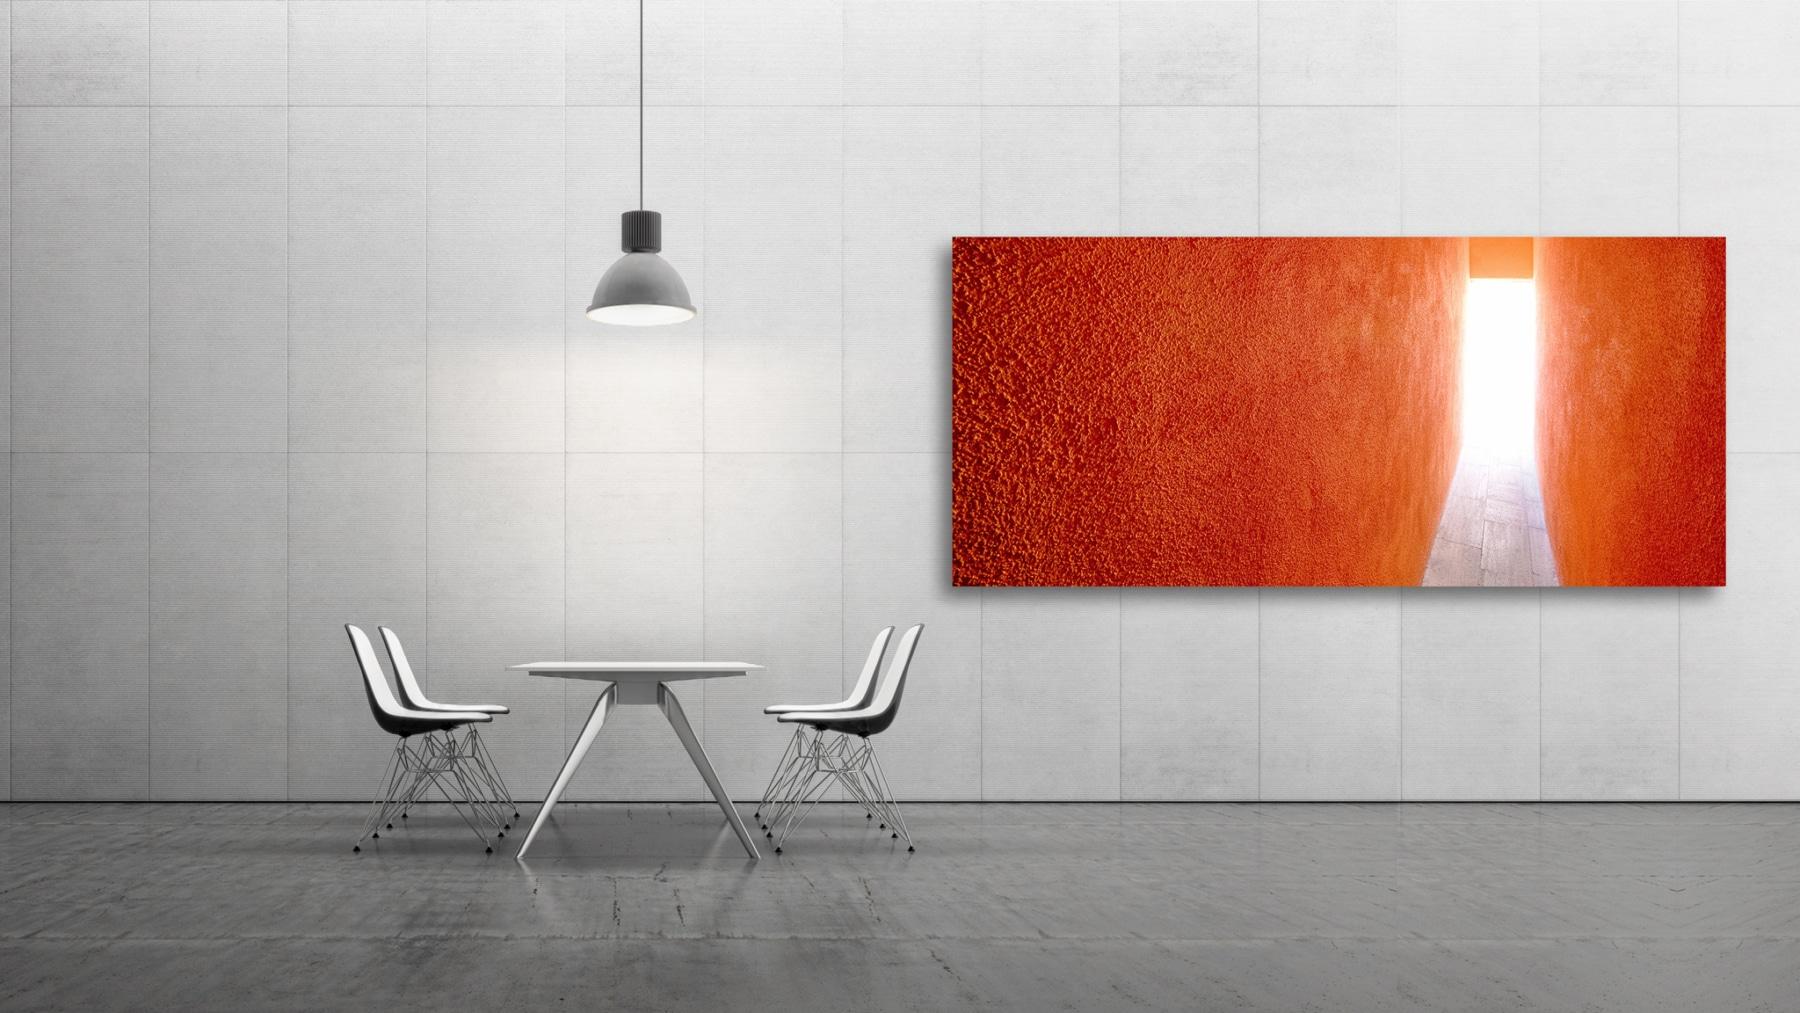 Orange Gate, Fine Art, Color, Farbe, Italy, Venedig, Burano, Gerry Pacher